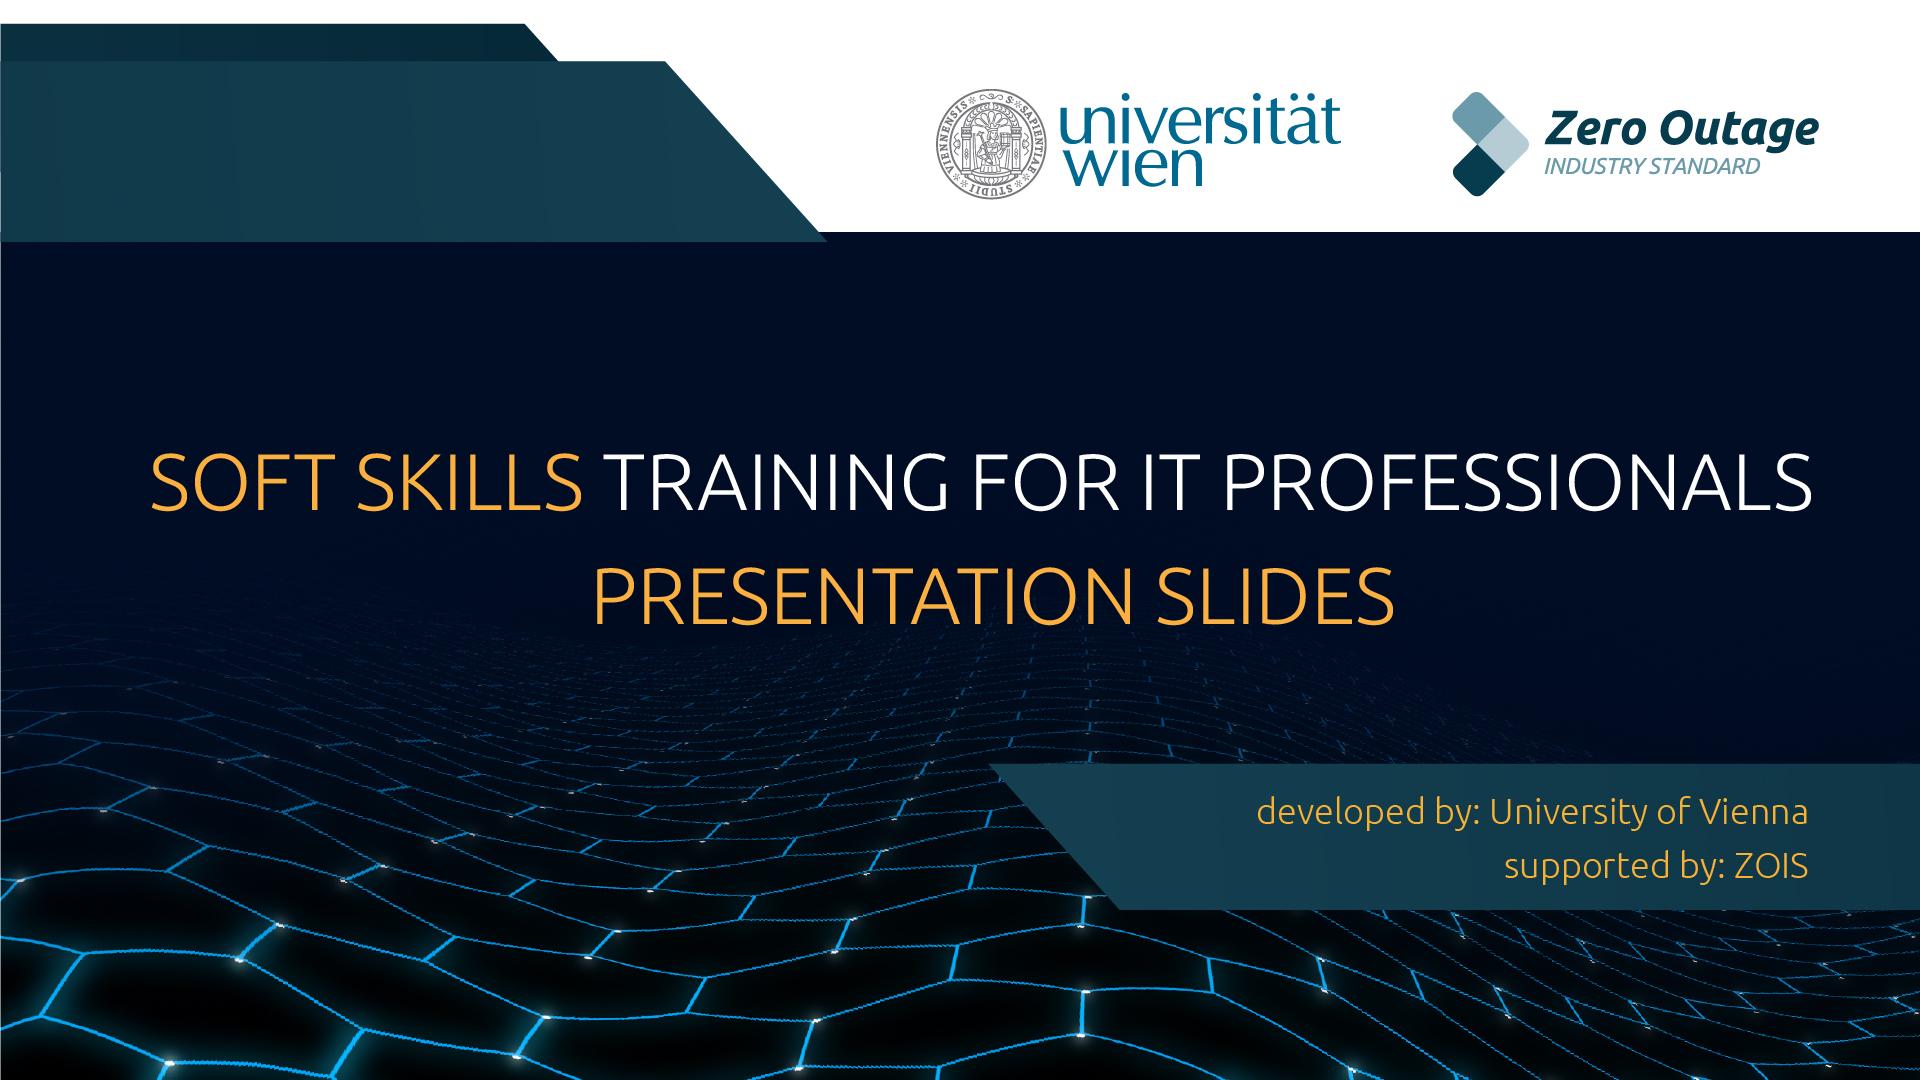 Soft Skills for IT Training Slides